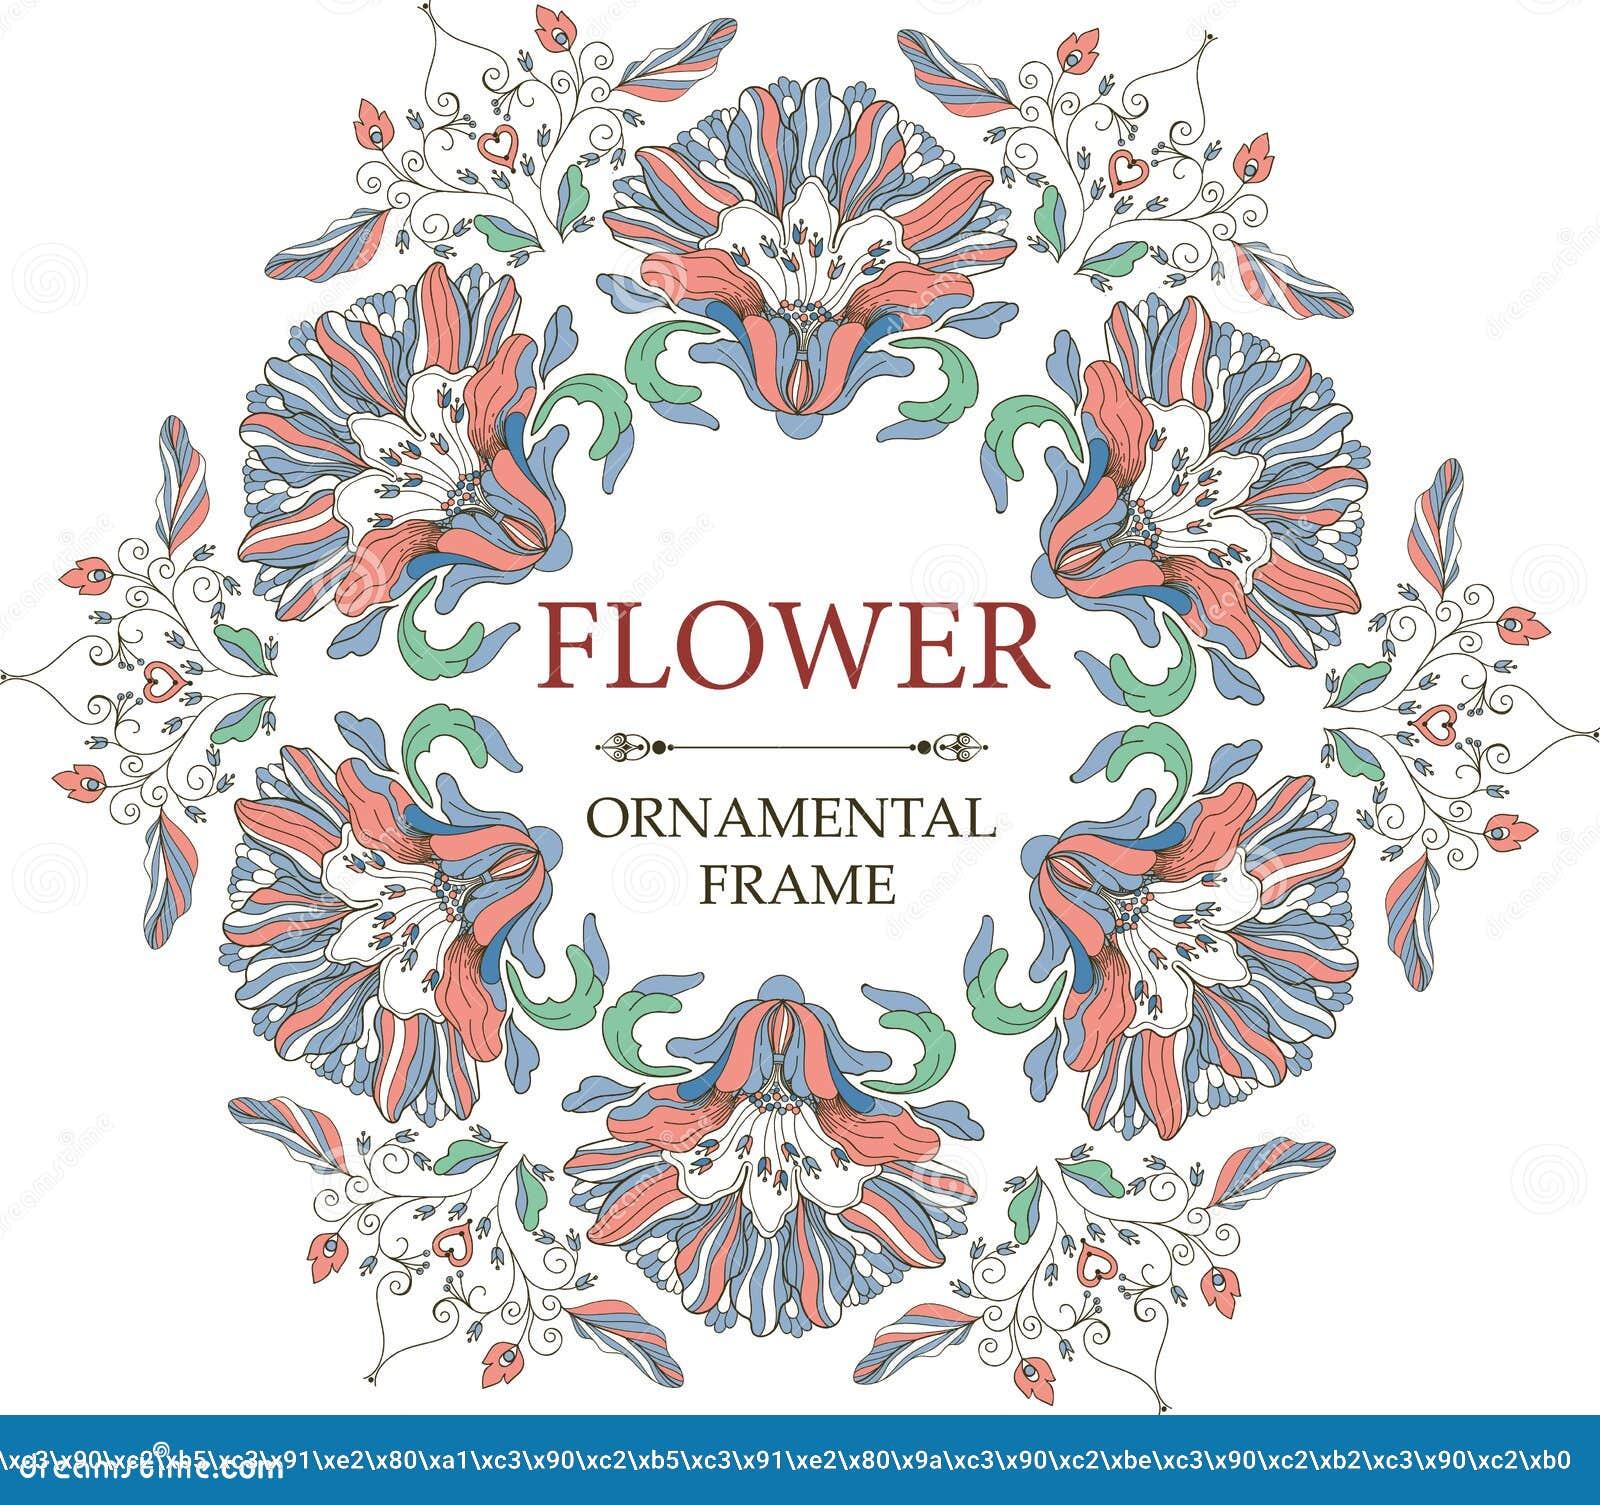 Ornamental floral frame in vintage style. Circular ornament.